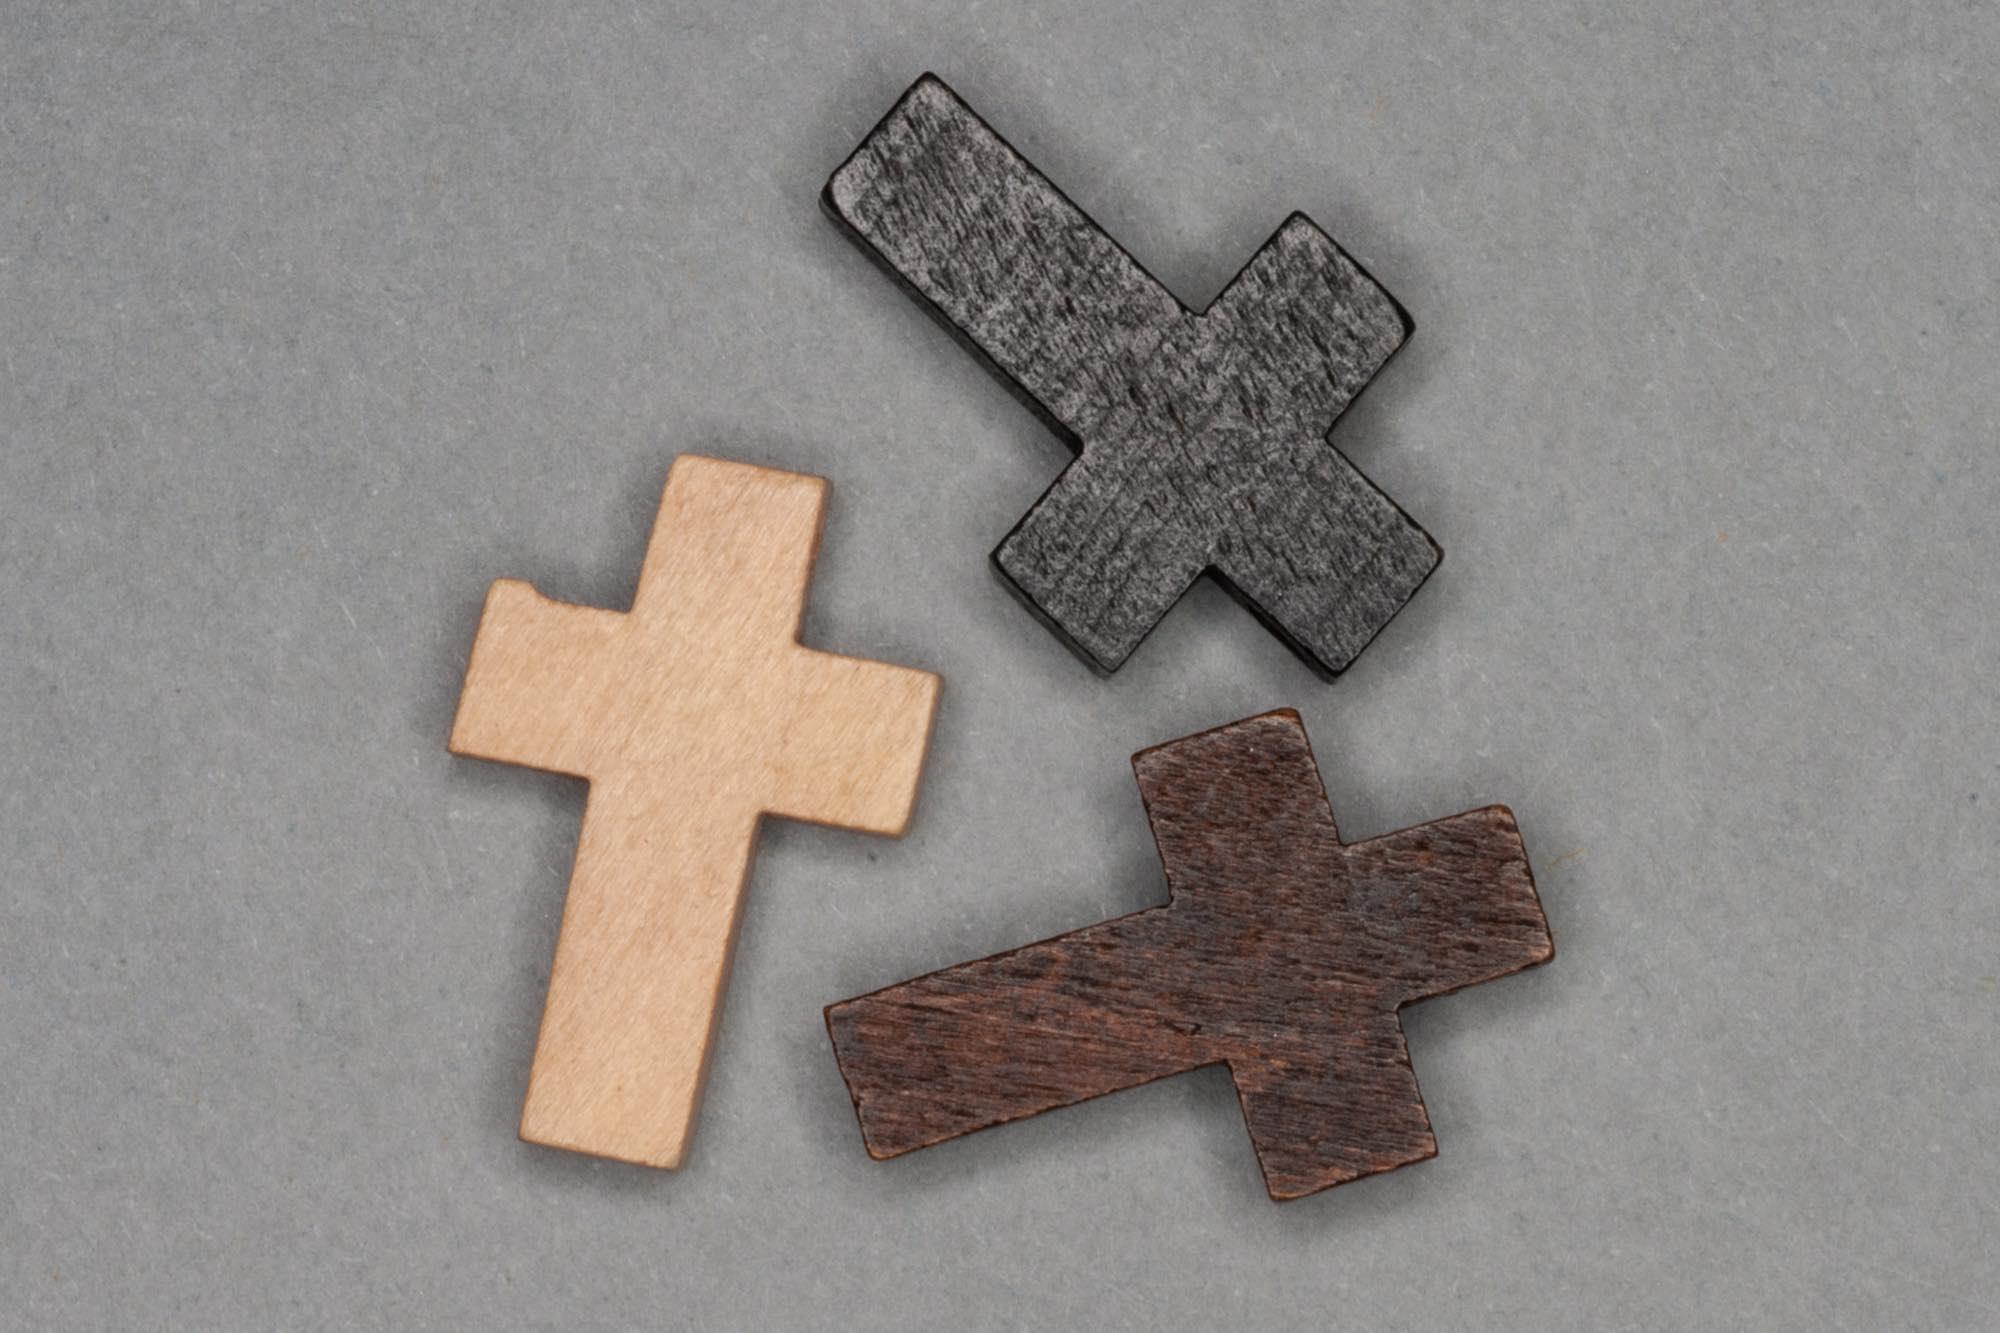 Wooden Cross pendant 25x15x4mm, 1mm hole